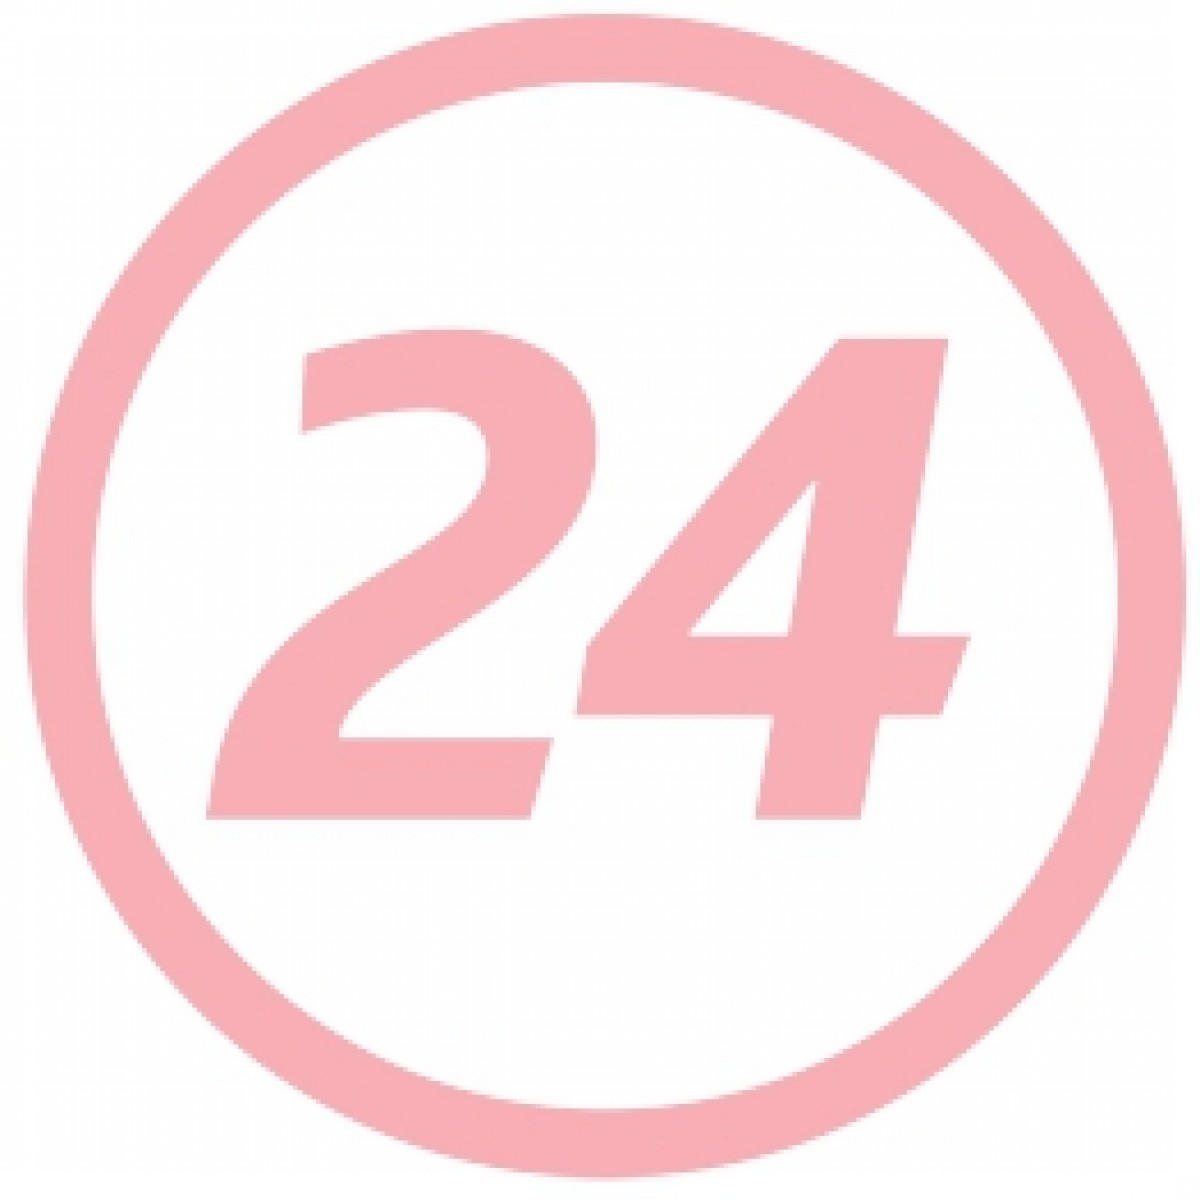 V-Activ Capsule Pentru Barbati & Femei, Capsule, 20buc